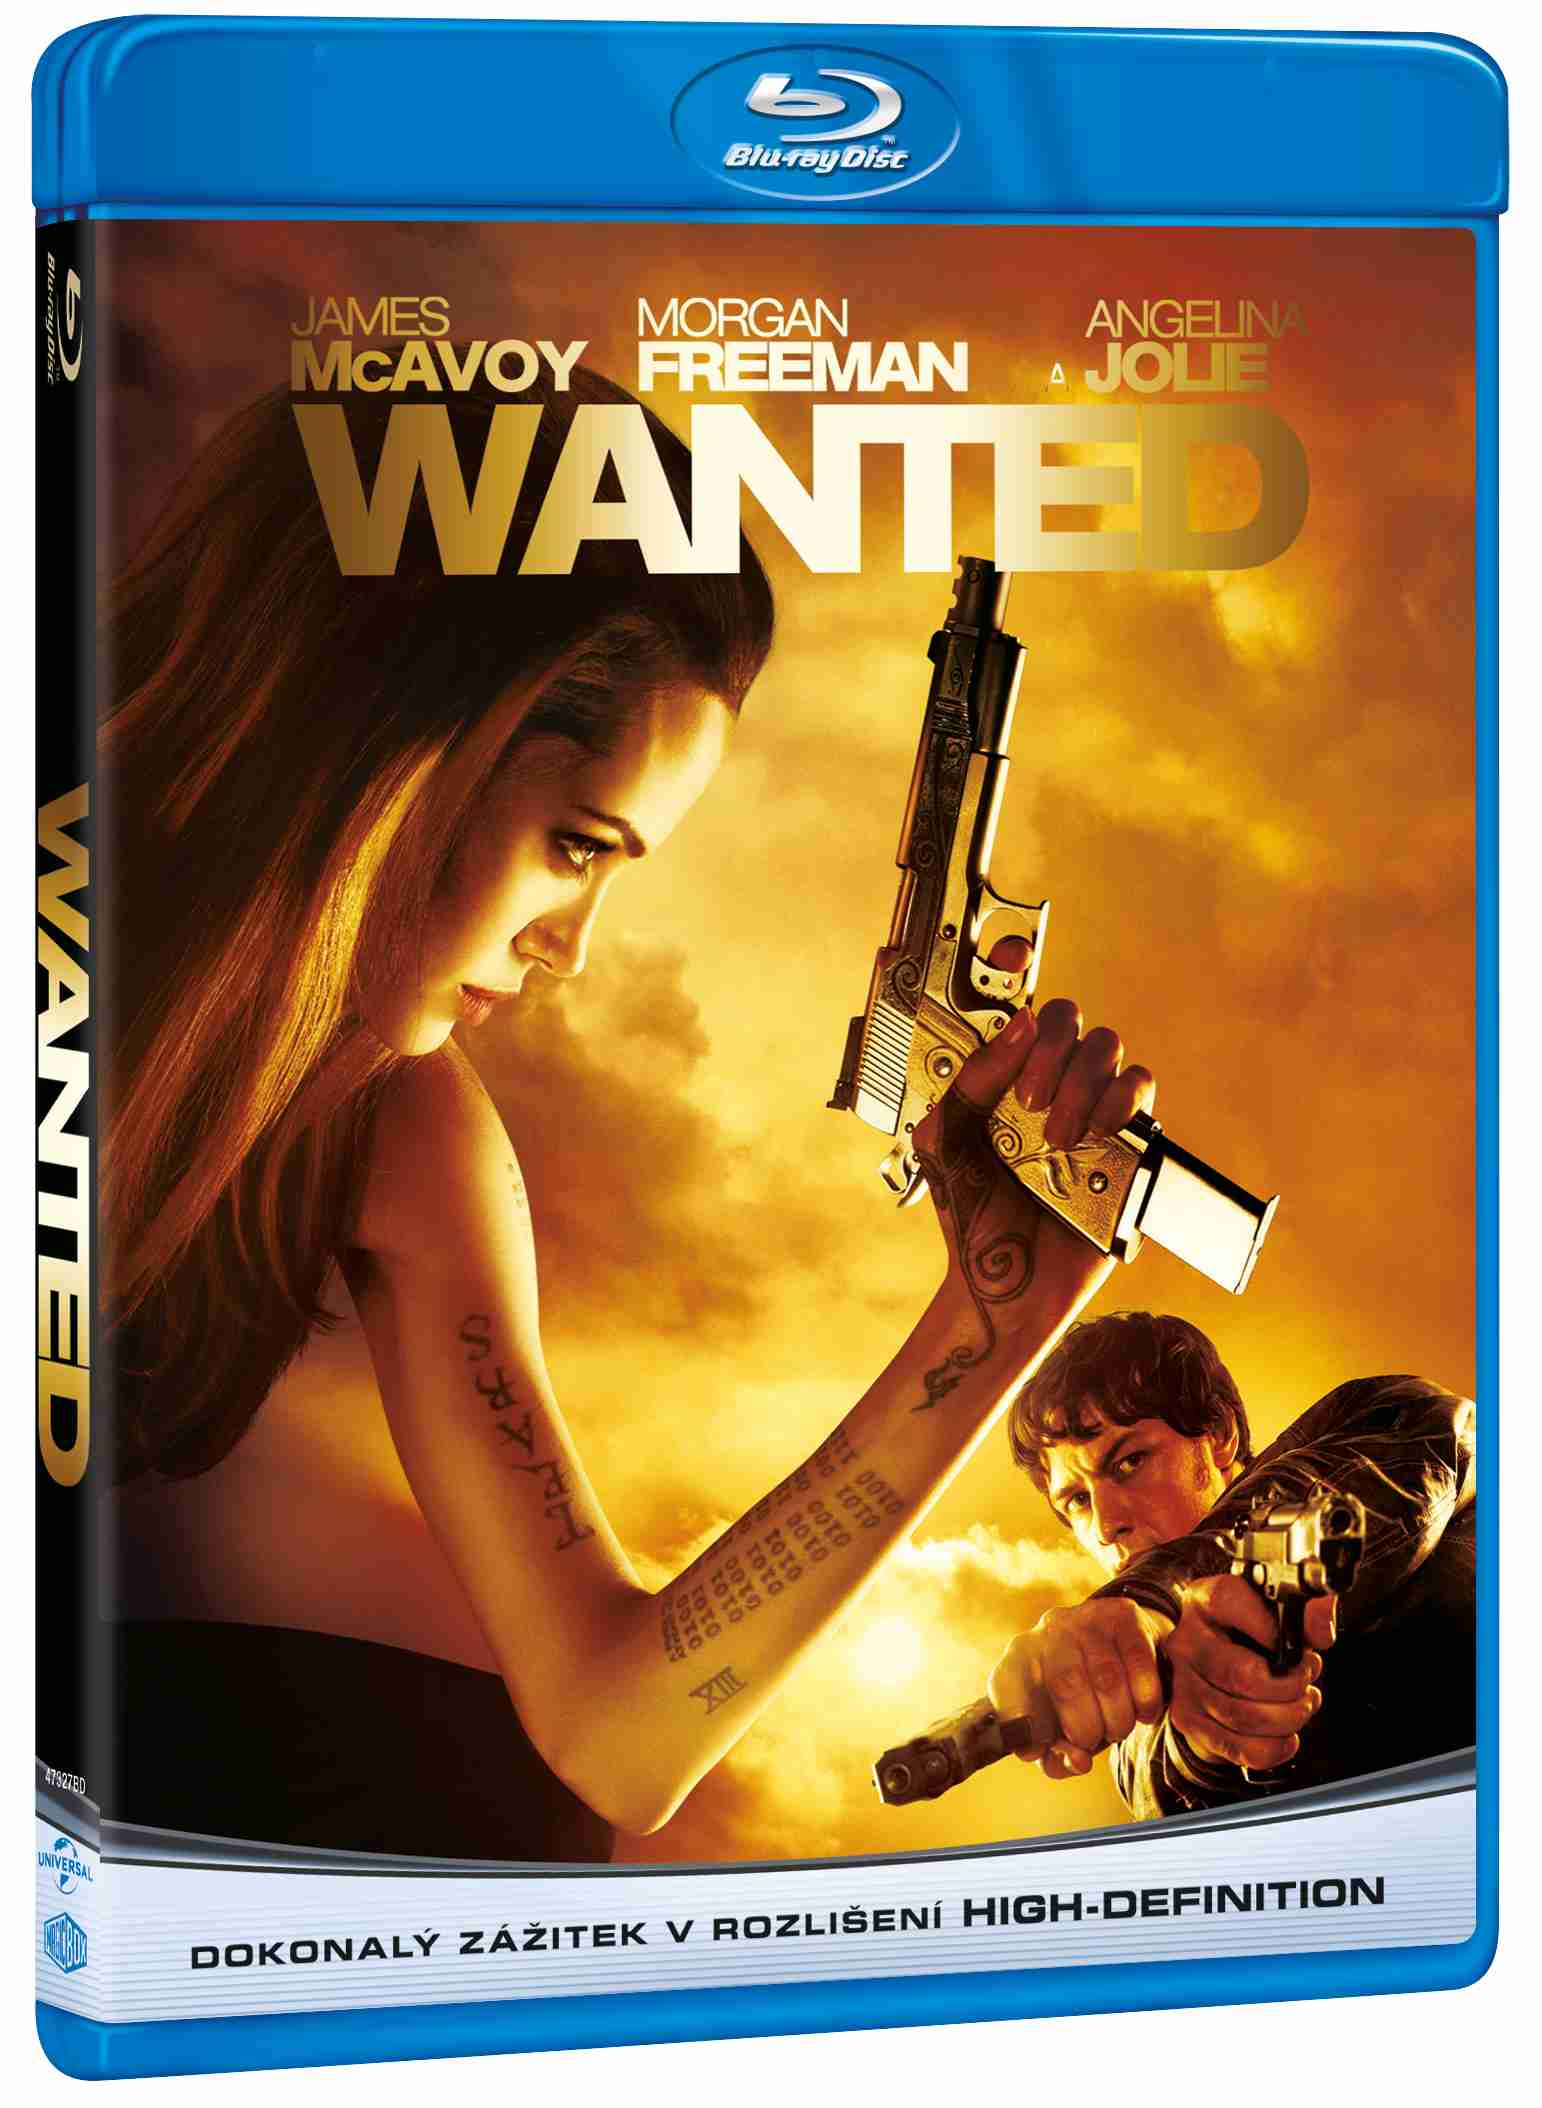 WANTED - Blu-ray